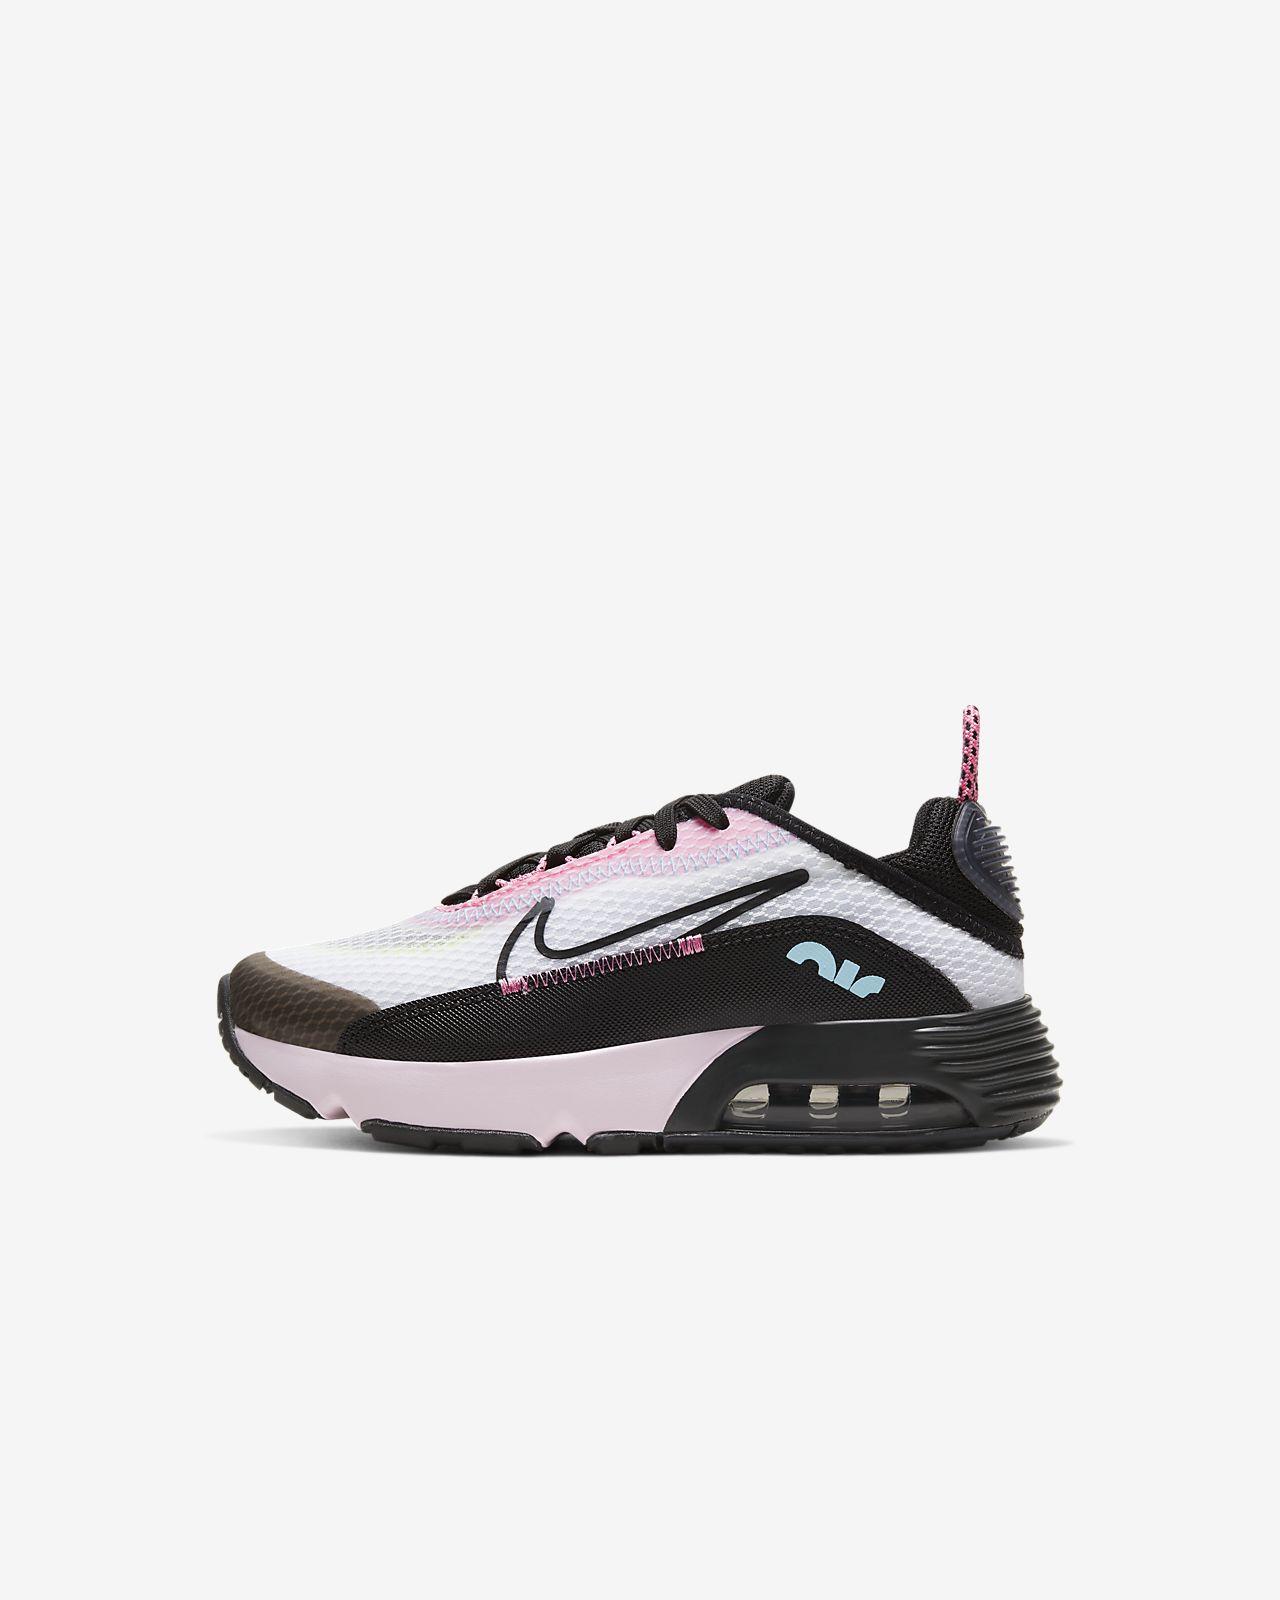 Nike Air Max 2090 cipő kisebb gyerekeknek